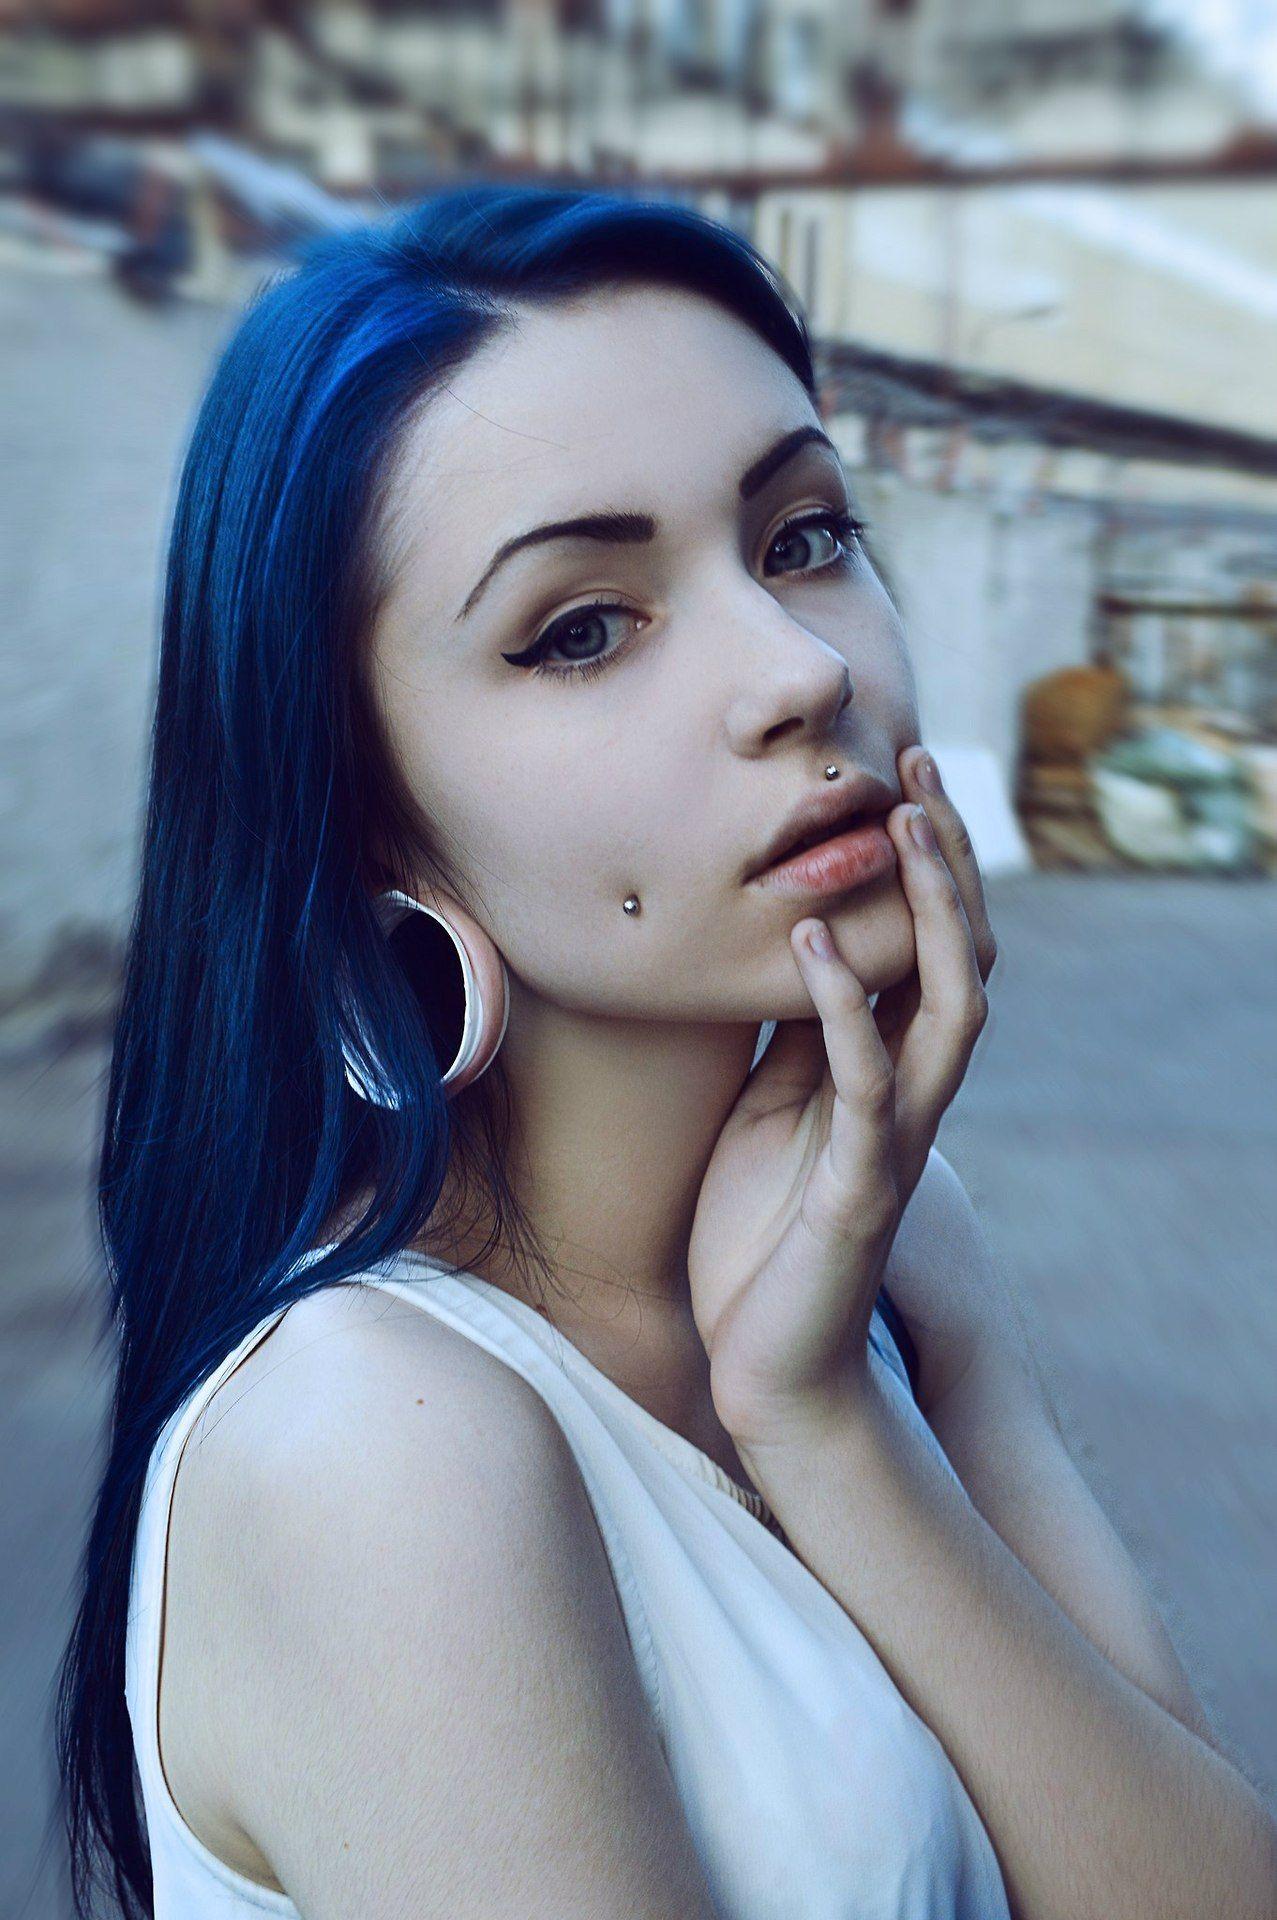 Skin growing over nose piercing  Lucretia WhitworthRoberts itzlulubabe on Pinterest